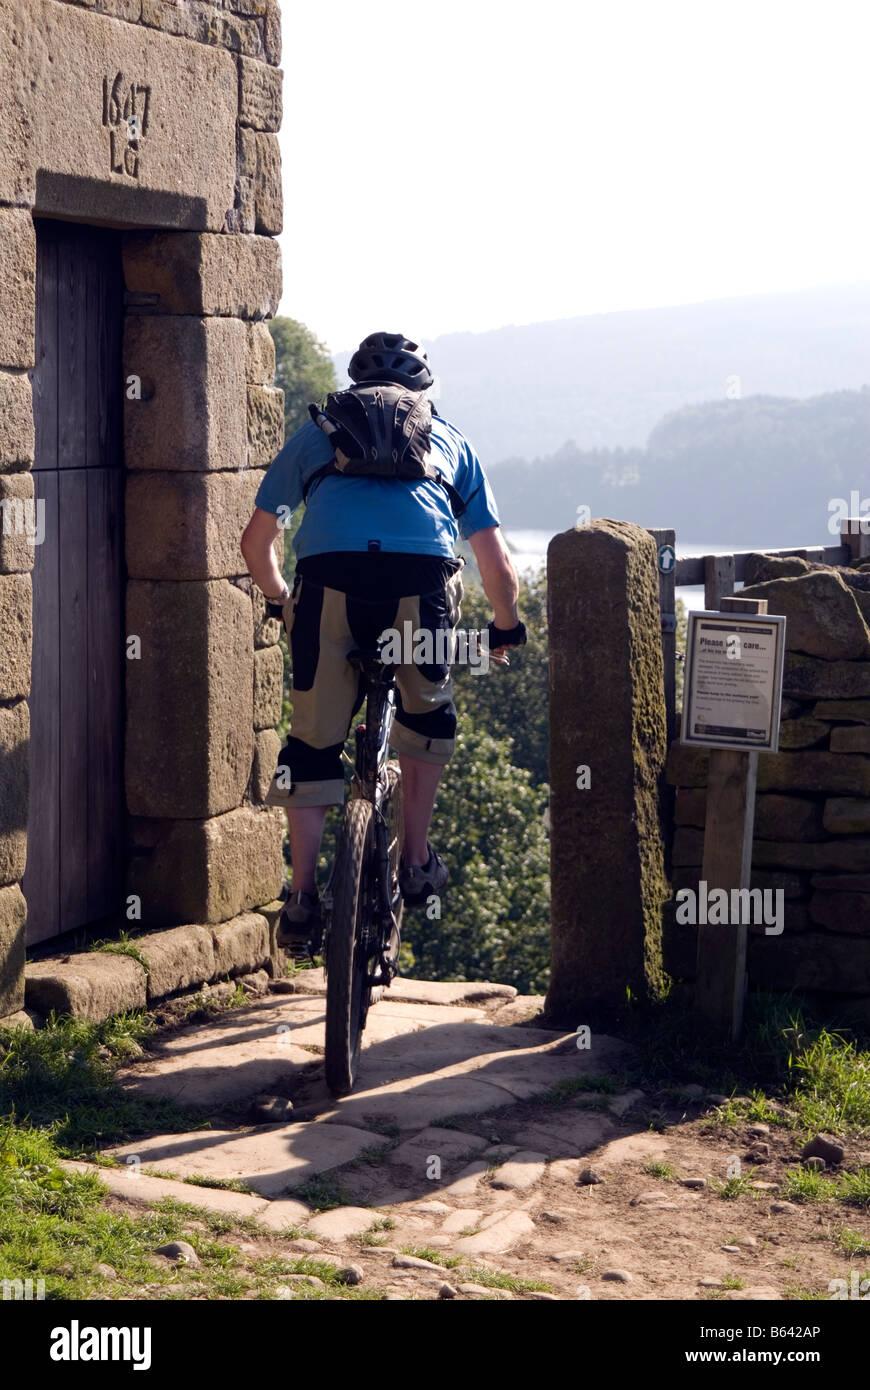 Mountain biking in the Peak District National Park Derbyshire visit tourist tourism Stock Photo